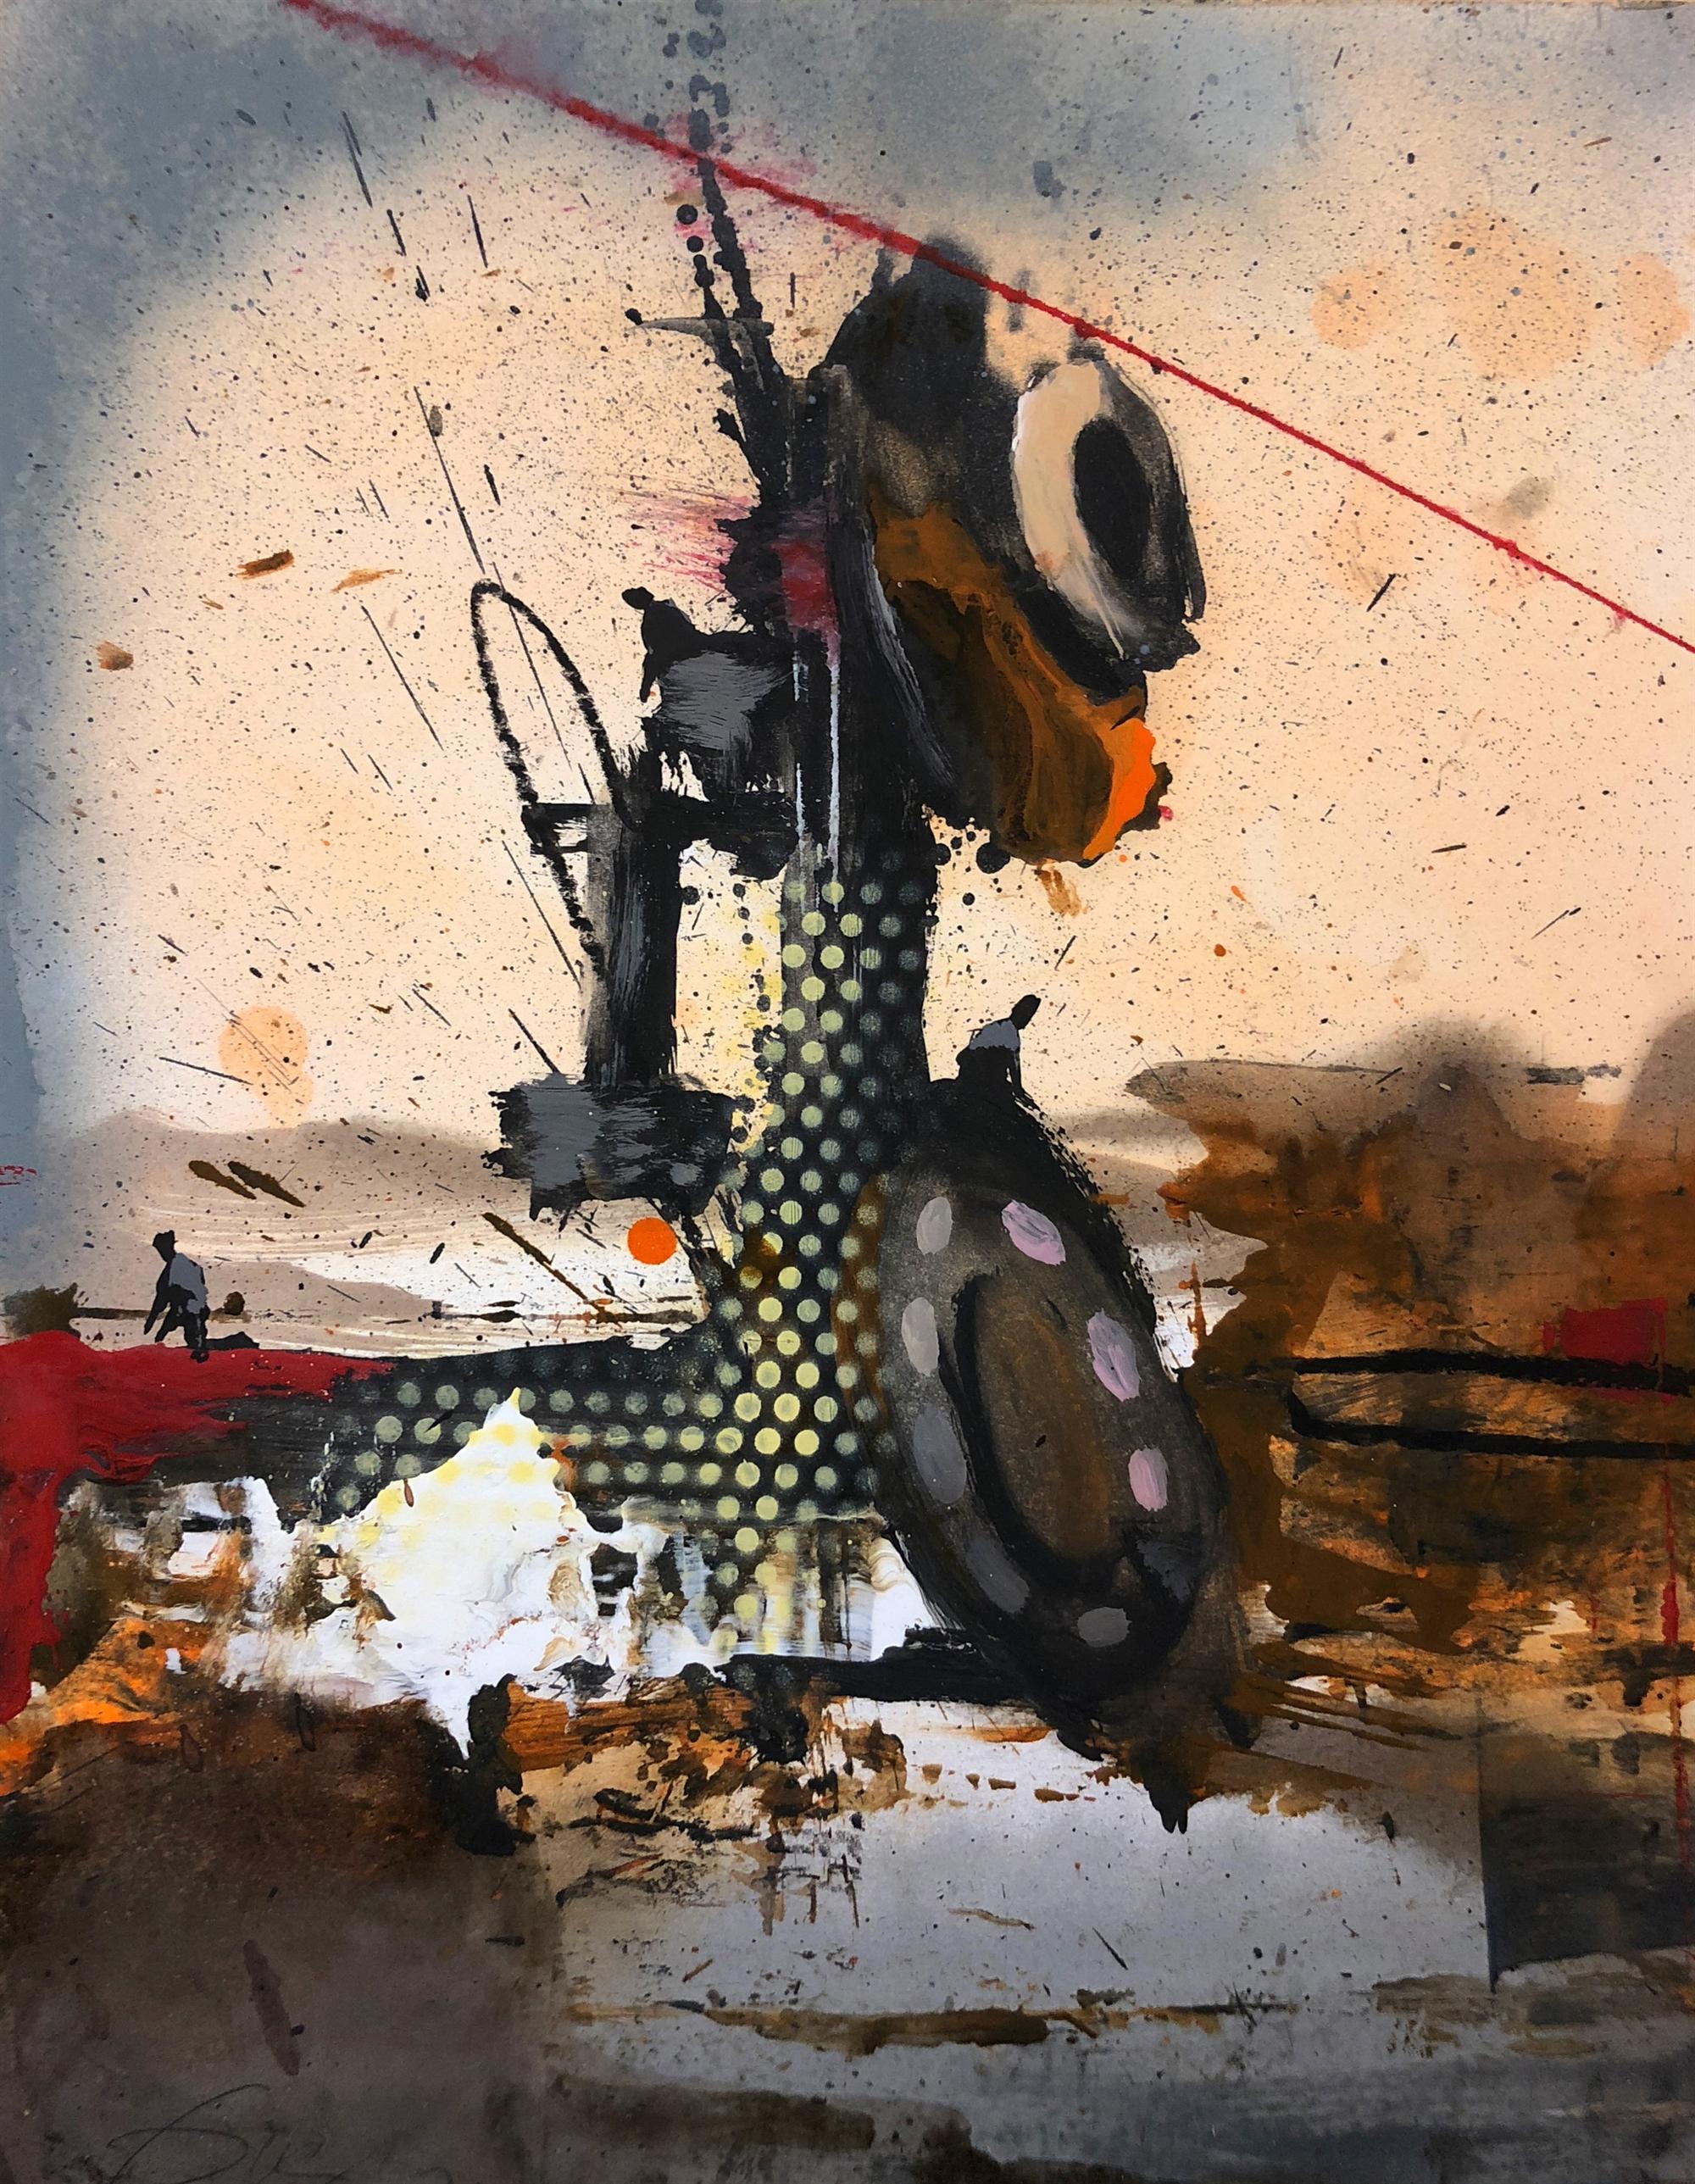 Orwellian 5 by Marcus Jansen